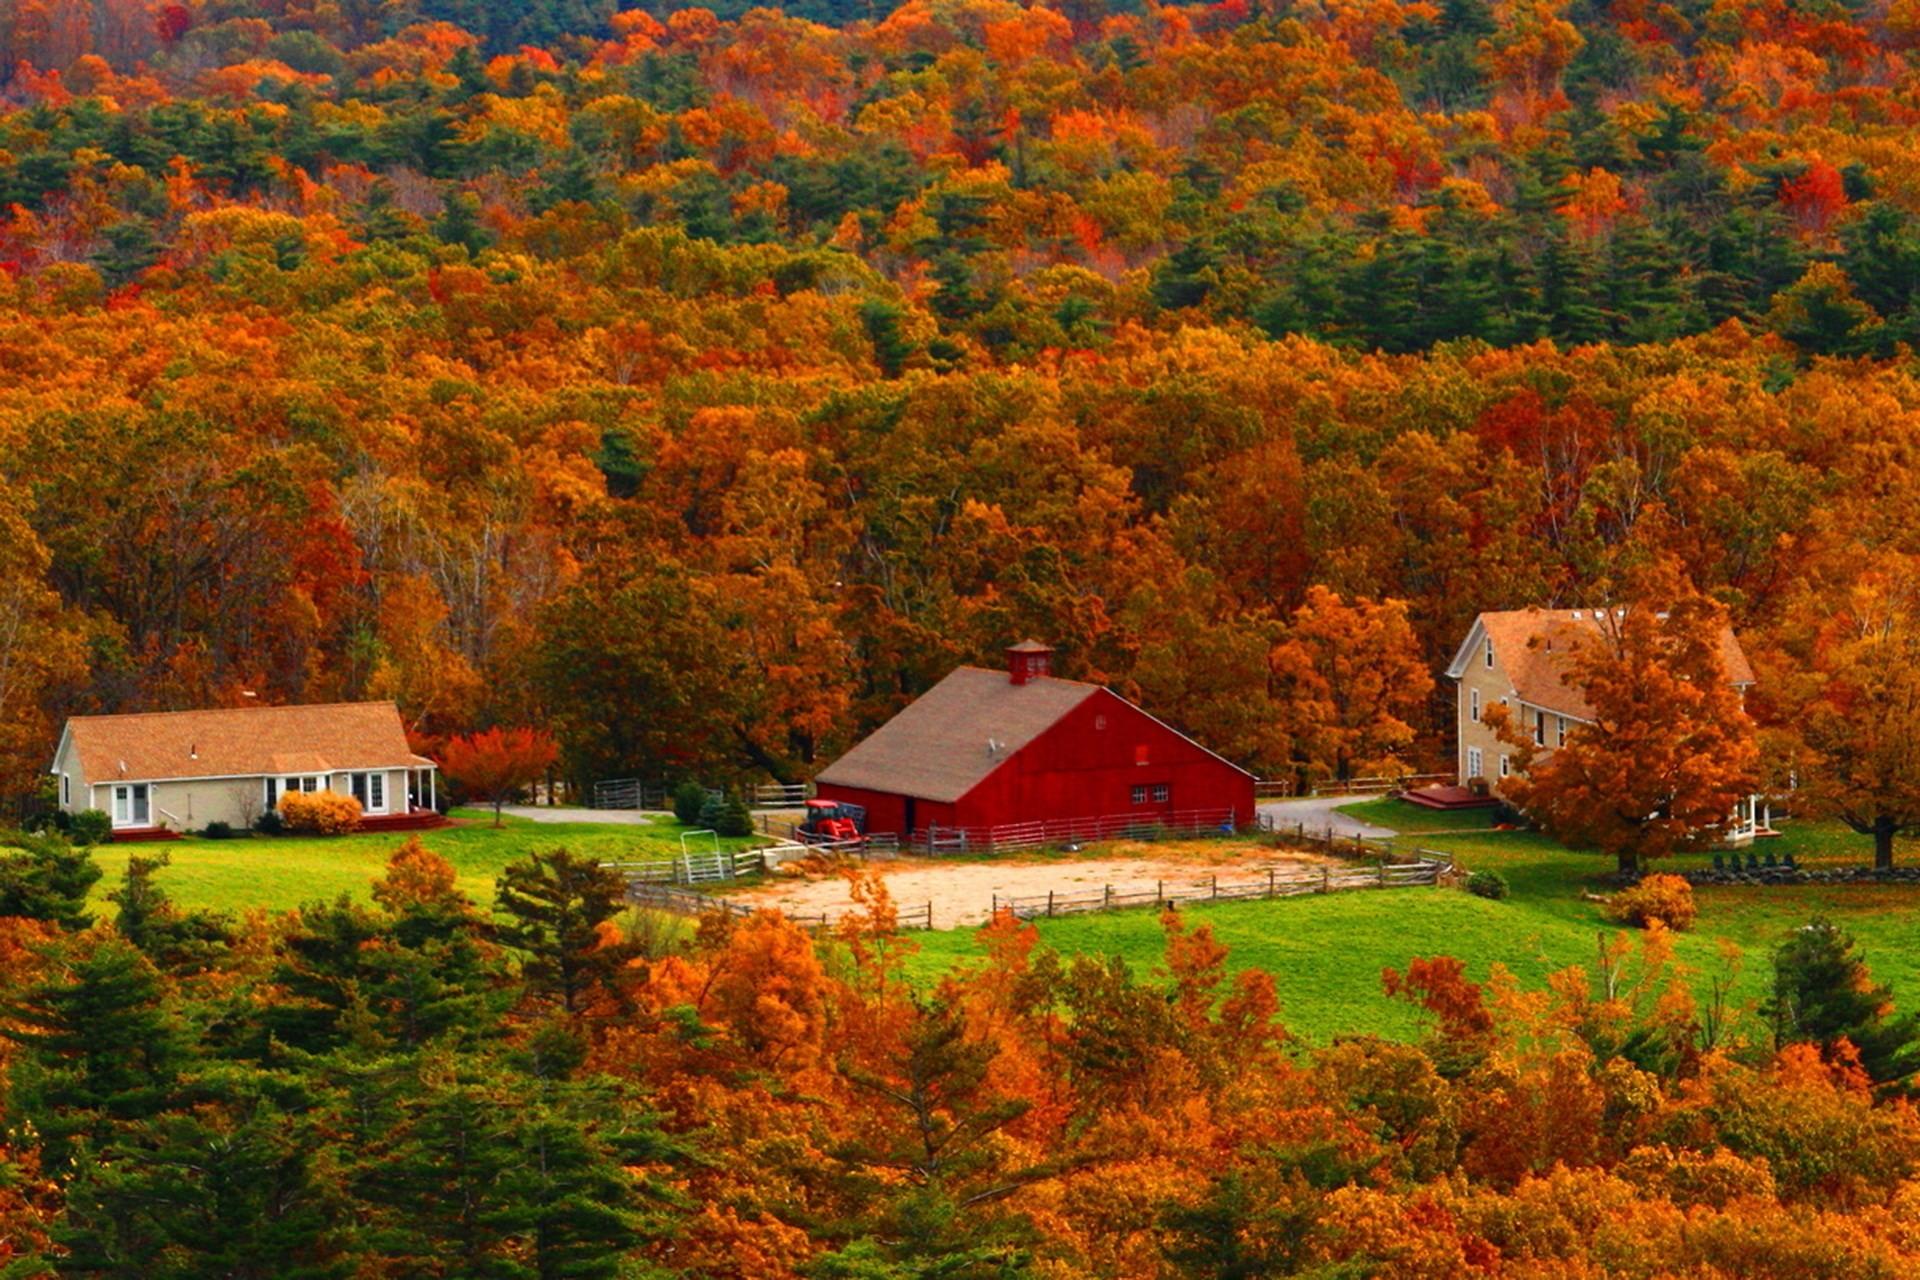 px windows wallpaper barn by Jaylen Walter for :  pocketfullofgrace.com